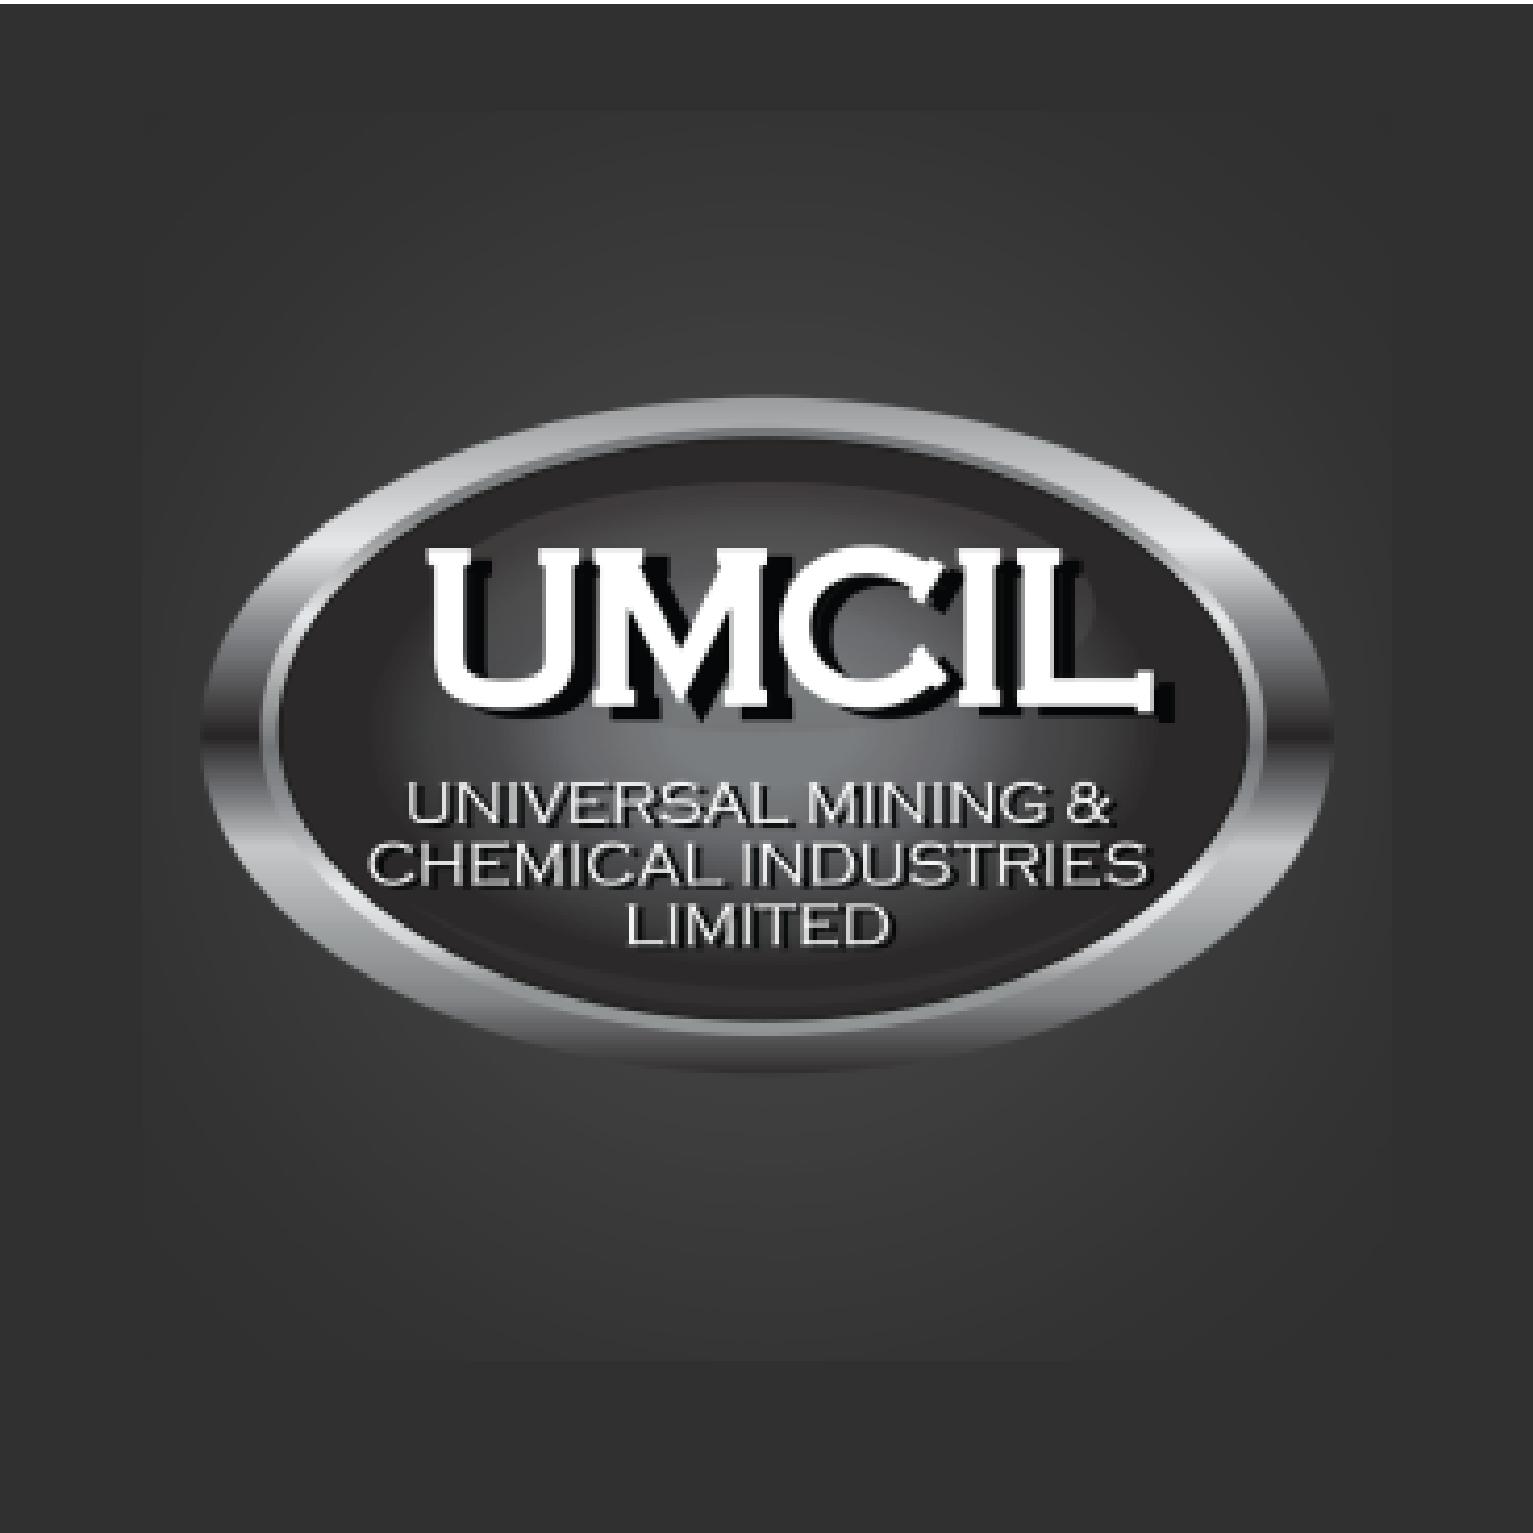 Universal Mining